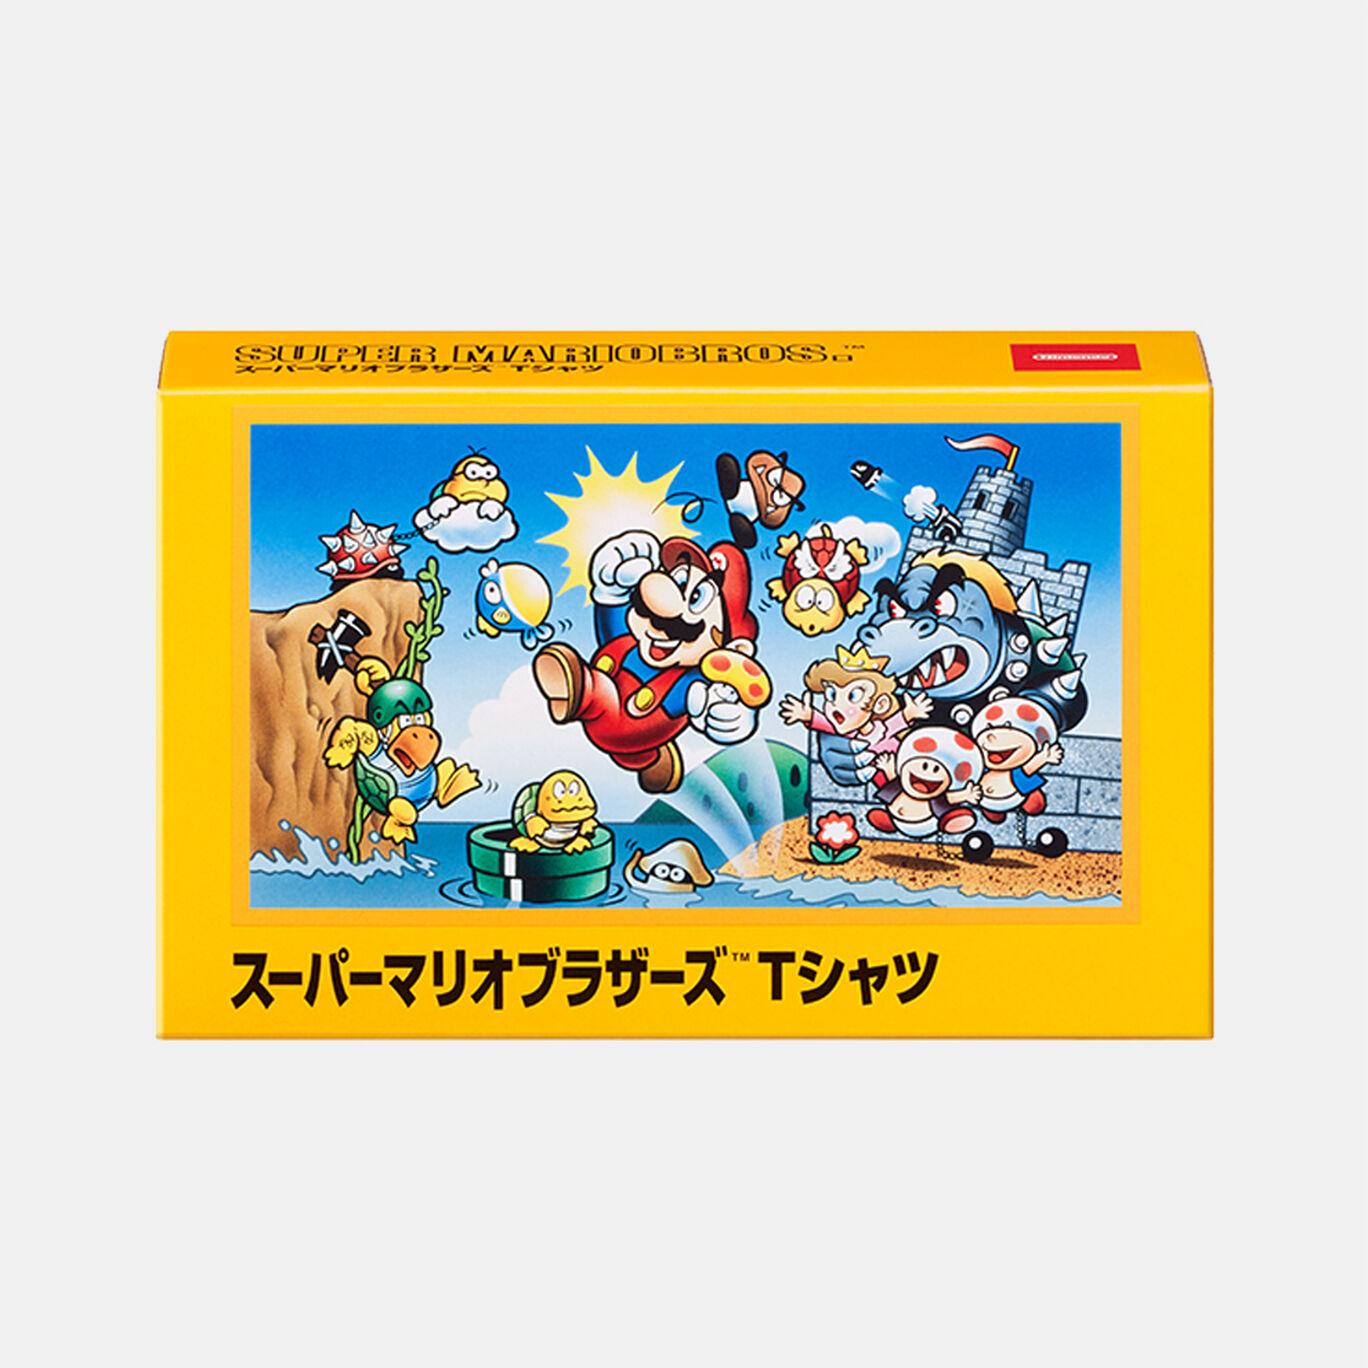 Tシャツ スーパーマリオブラザーズ M【Nintendo TOKYO取り扱い商品】